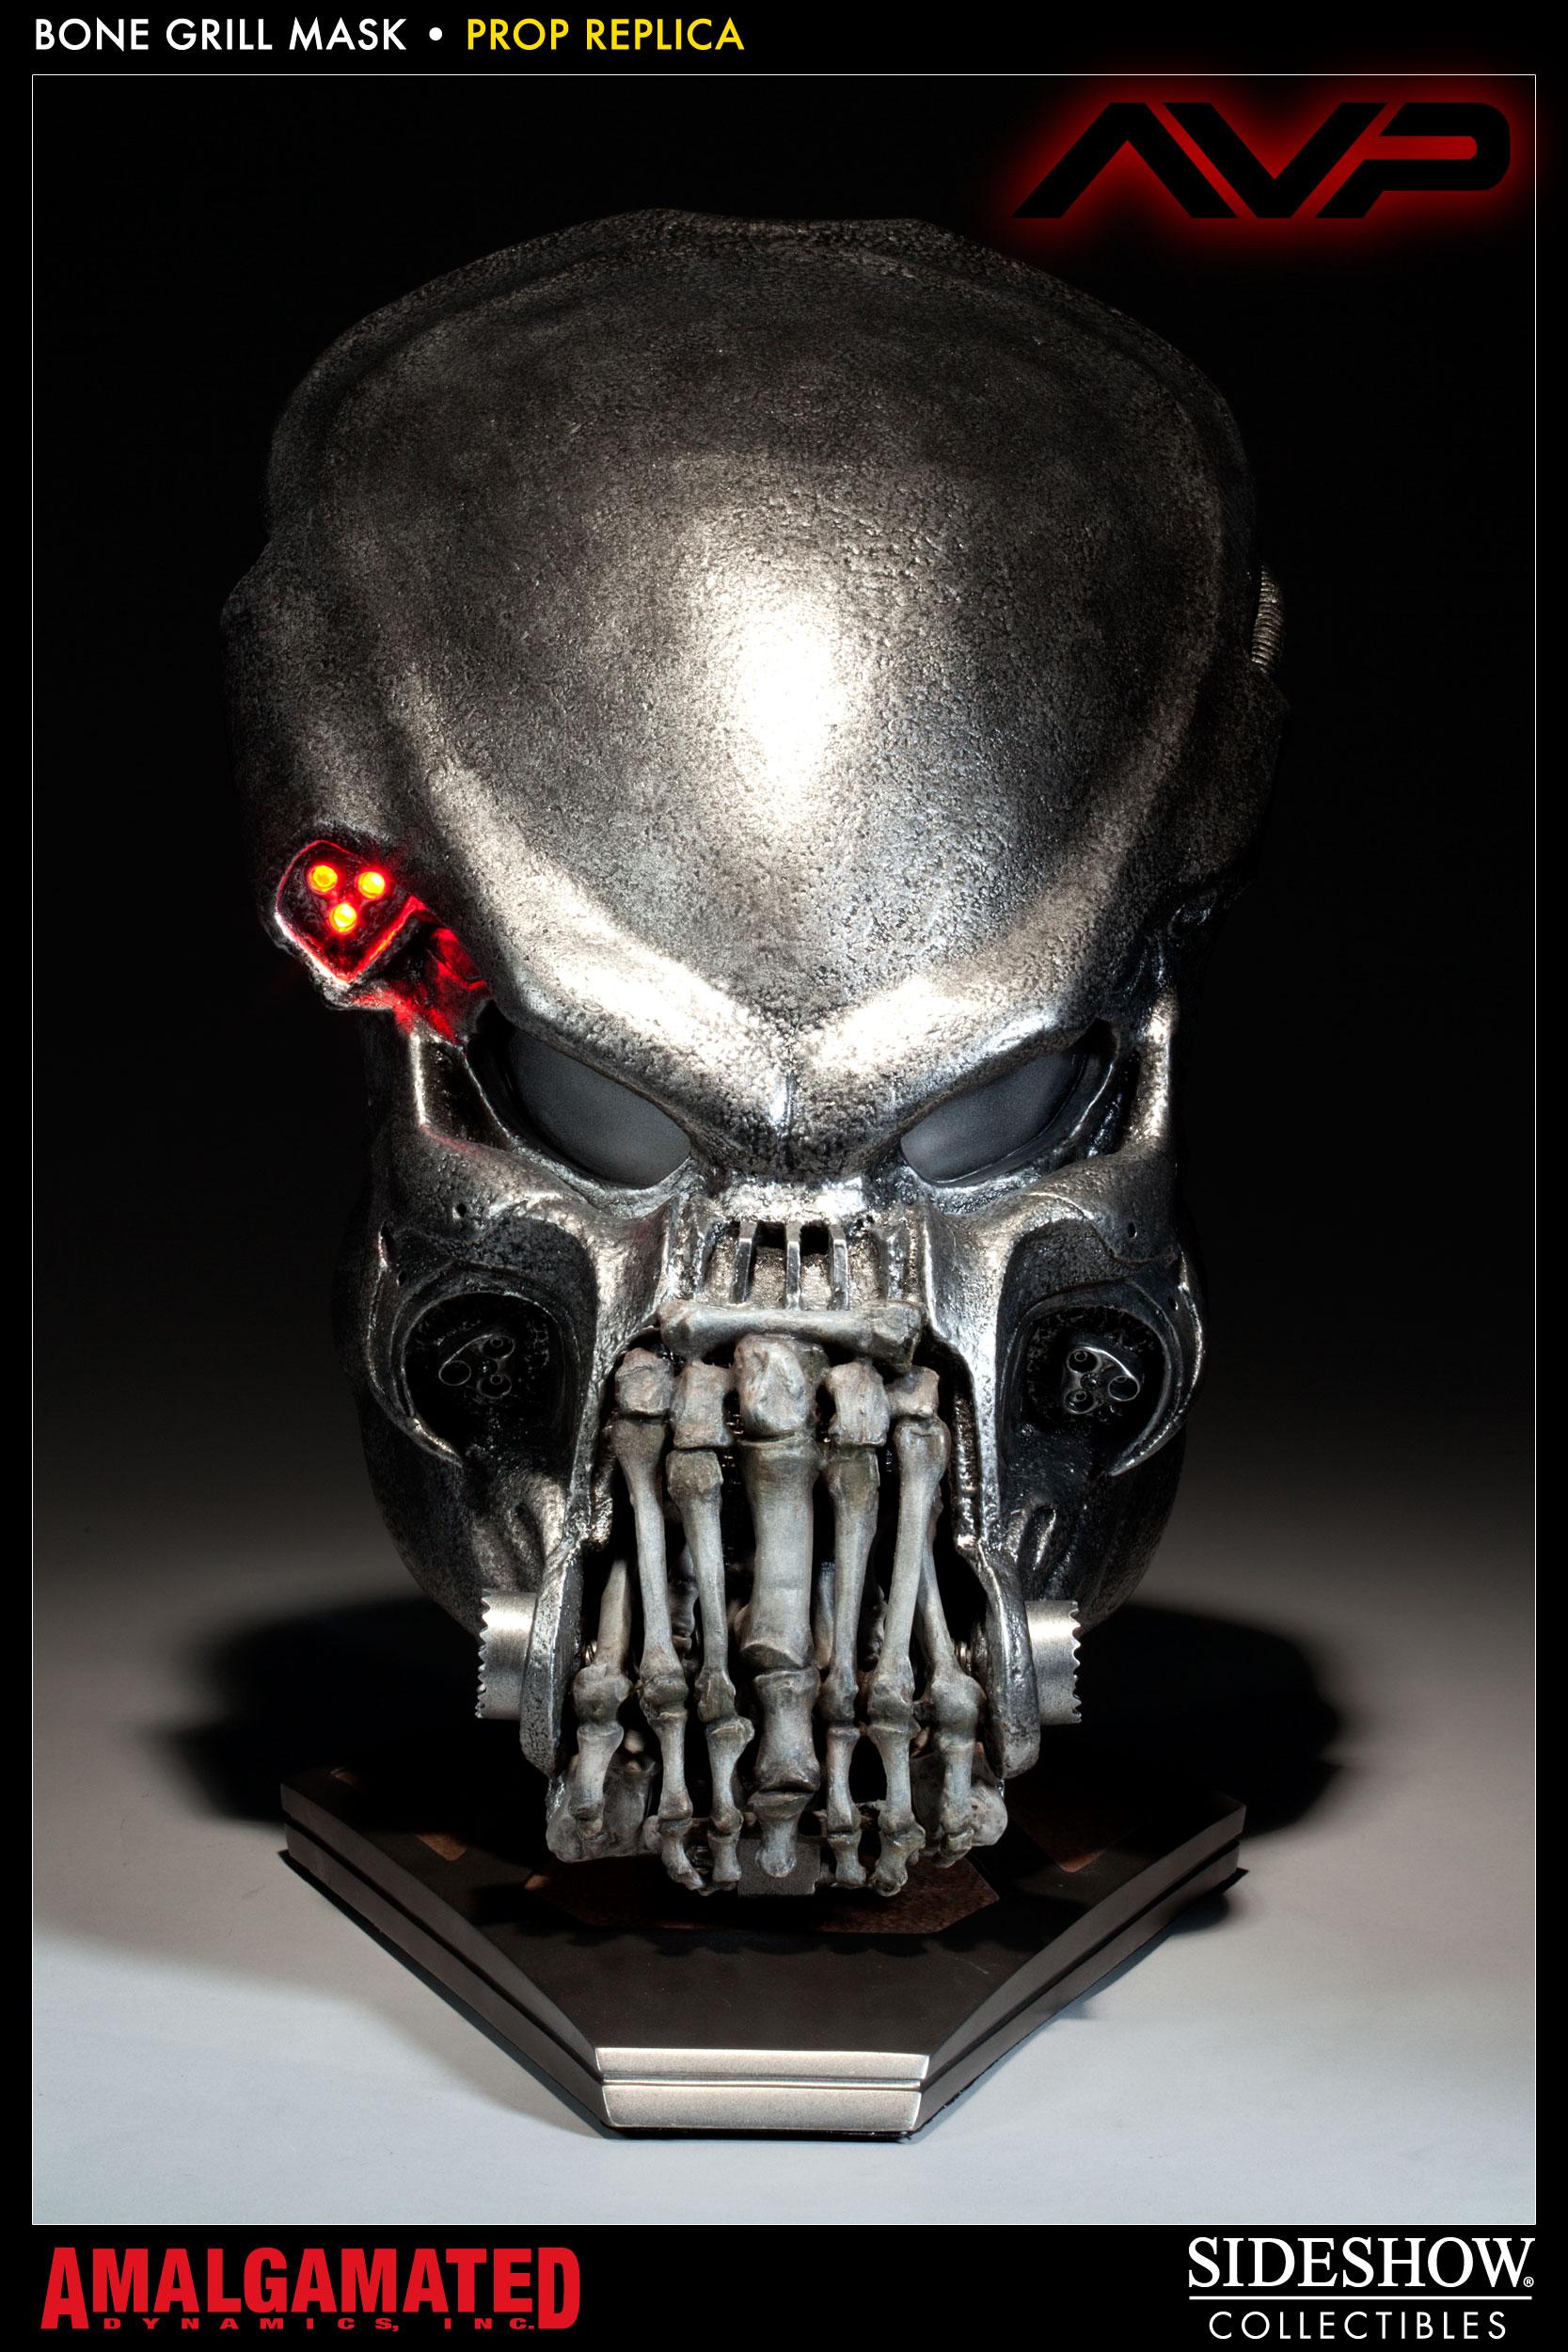 Sideshow-AVP-Predator-Bone-Grill-Bio-01.jpg